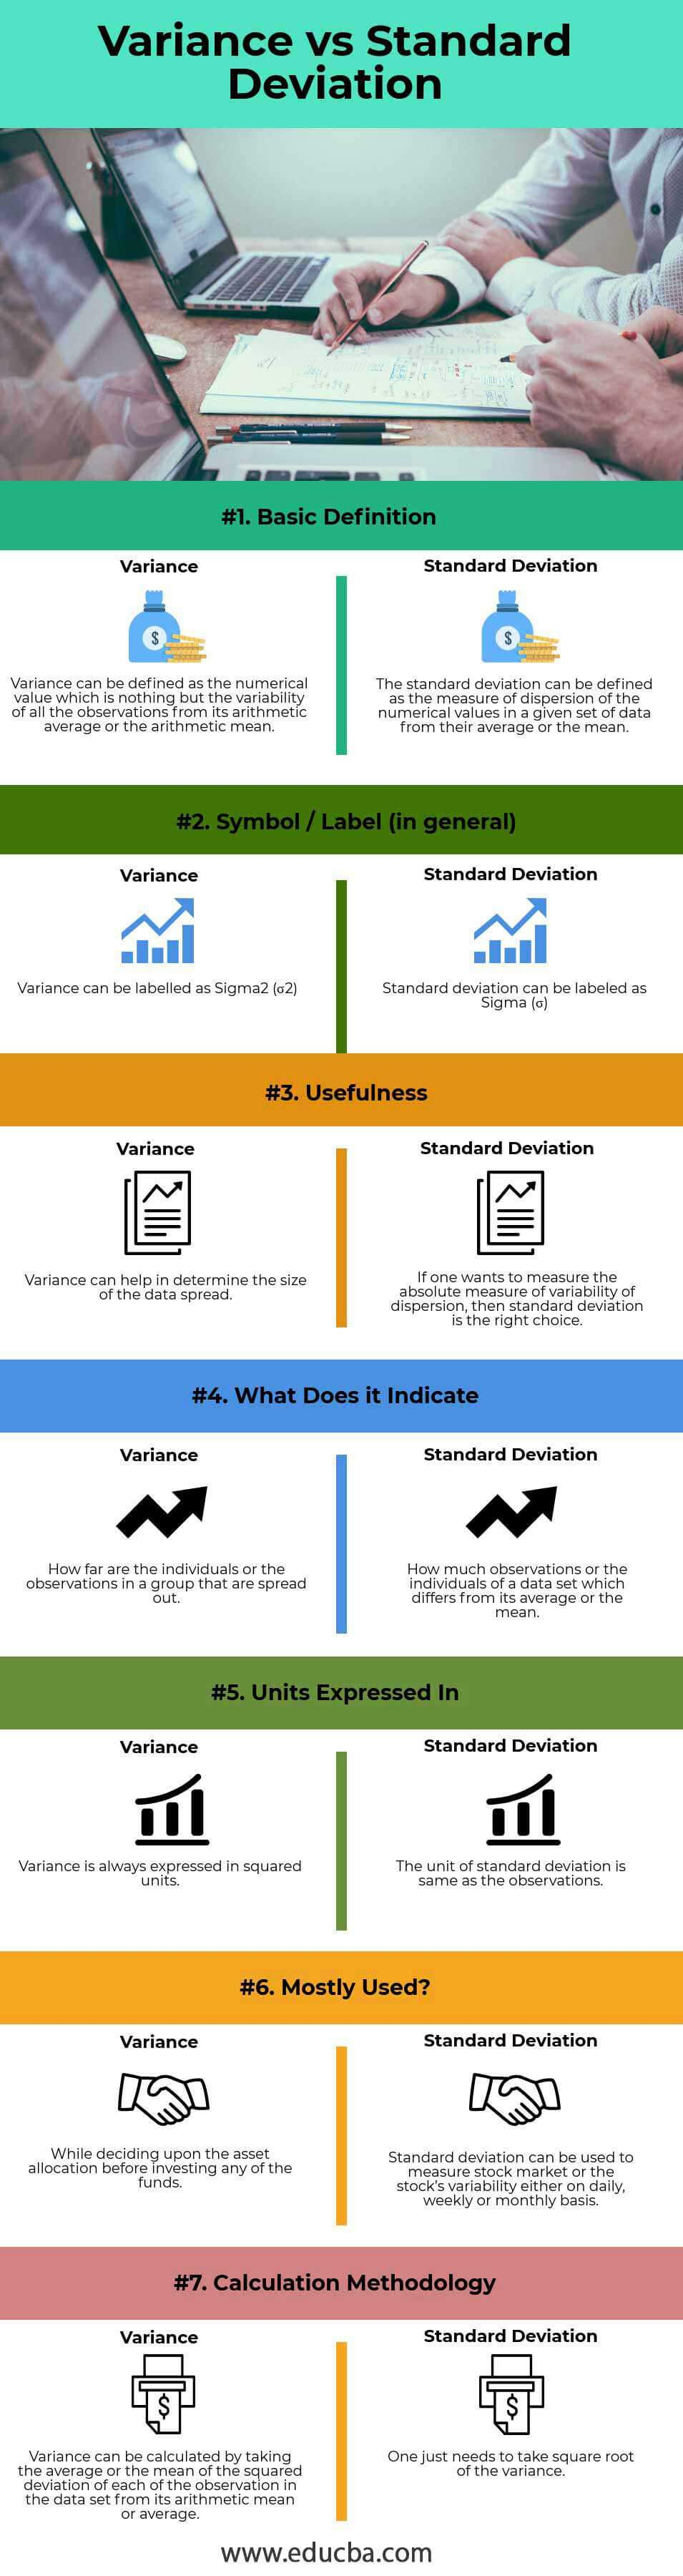 Variance-vs-Standard-Deviation-info